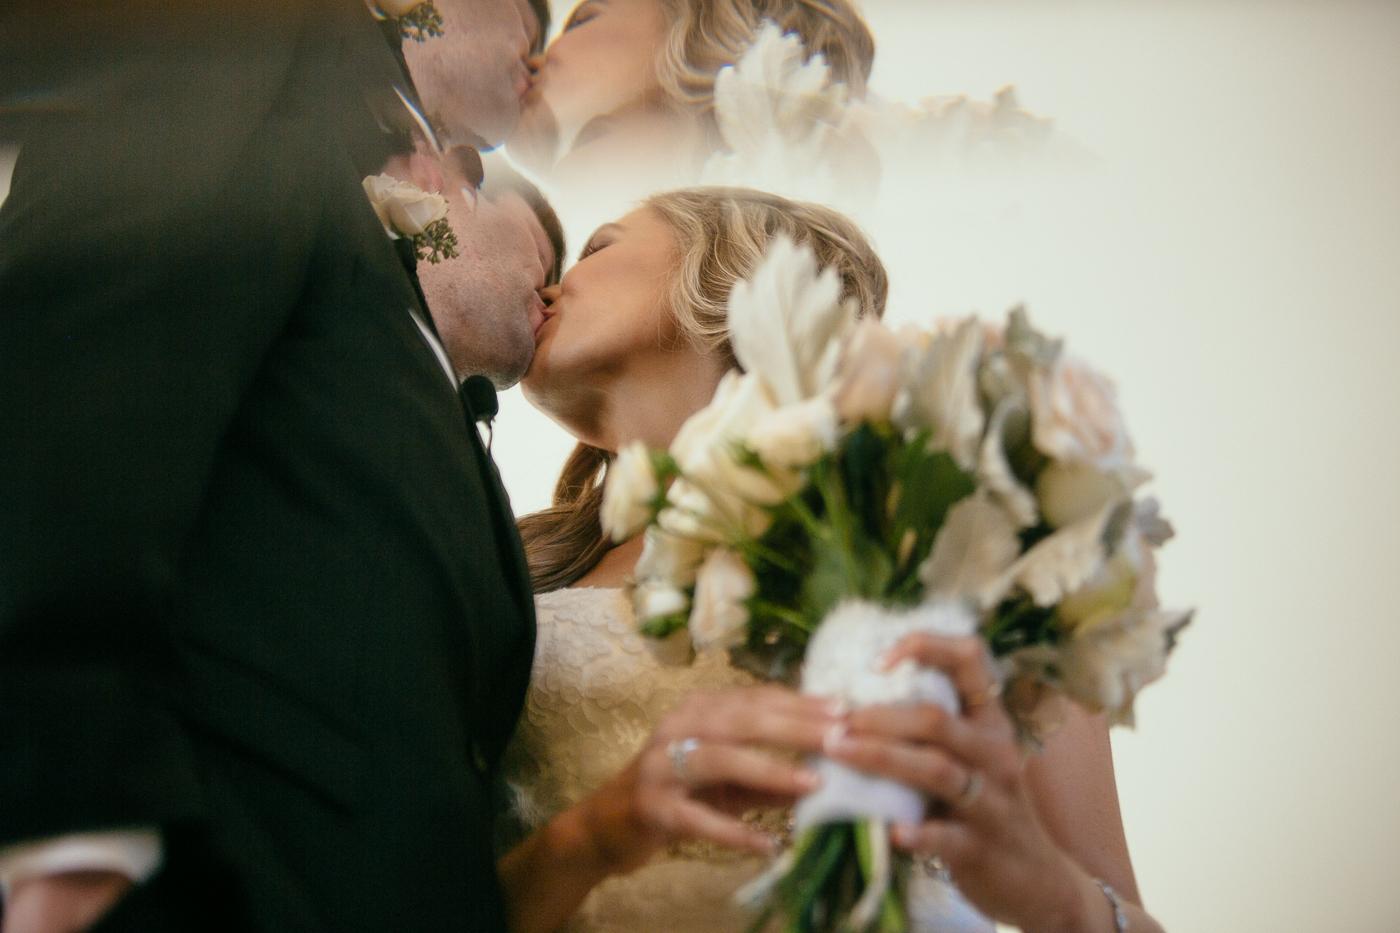 RYAN_&_KELLEY_DARLINGTON_HOUSE_WEDDING_2014_E79A9525.JPG